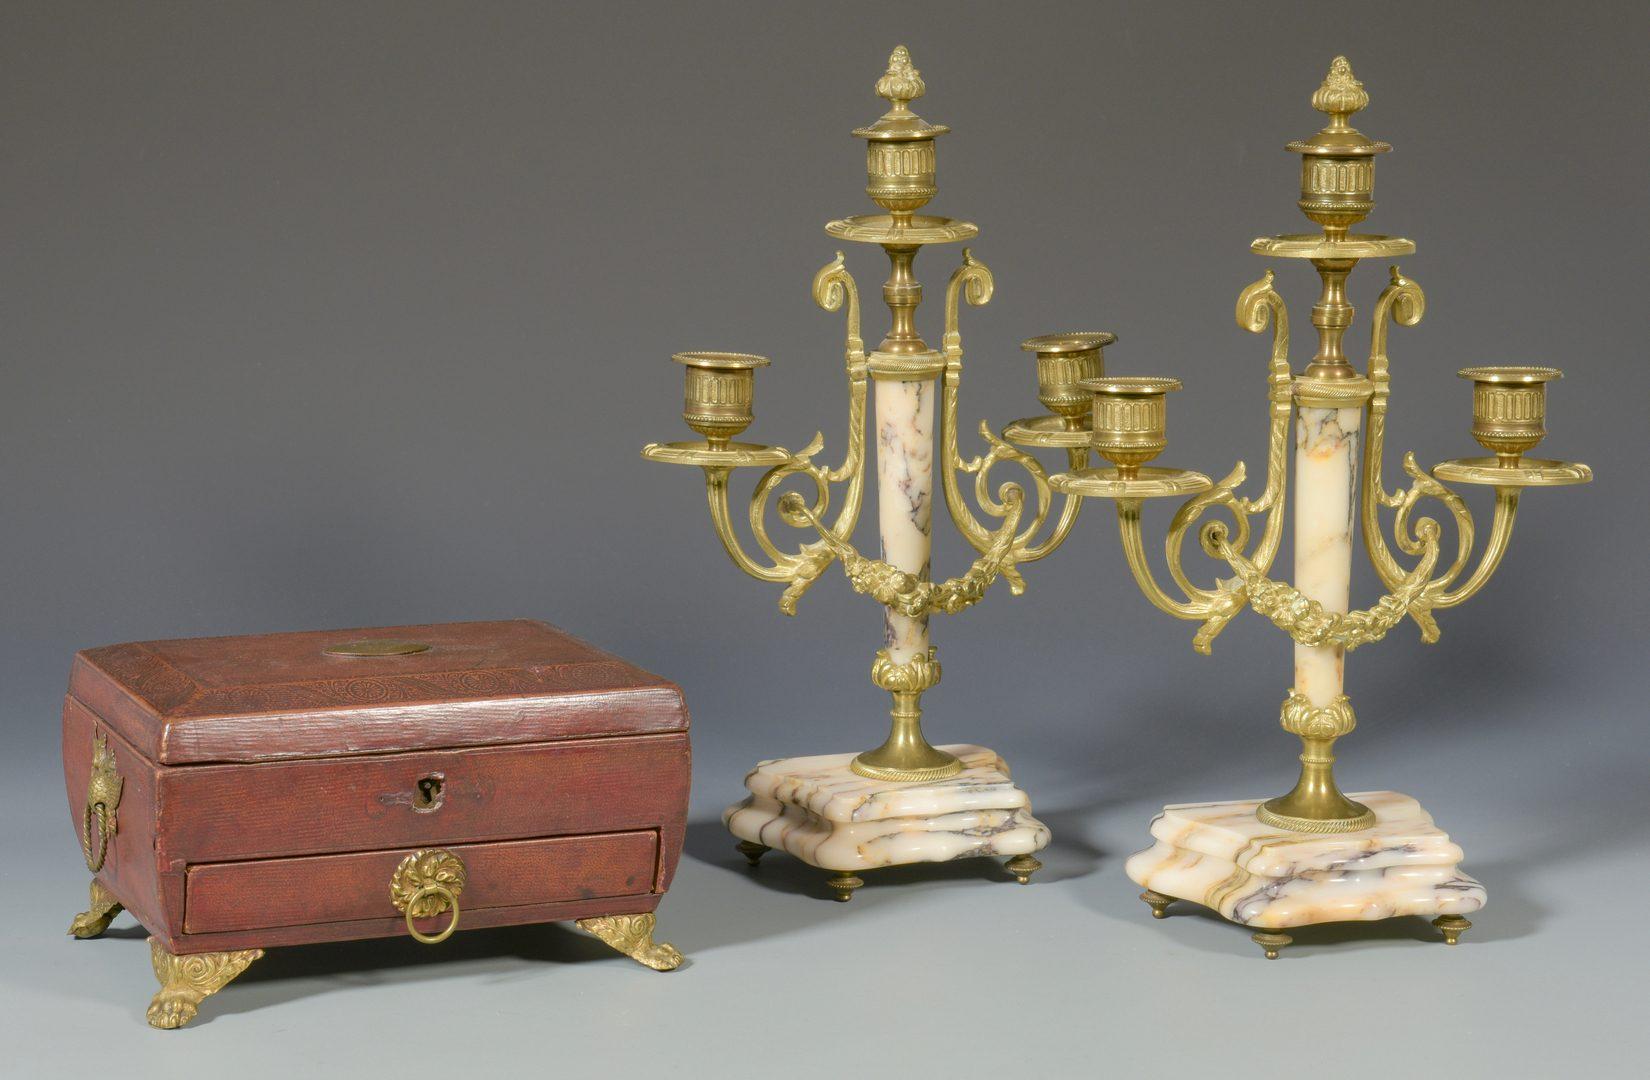 Lot 386: Pr. Candlesticks & Russian Trinket Box